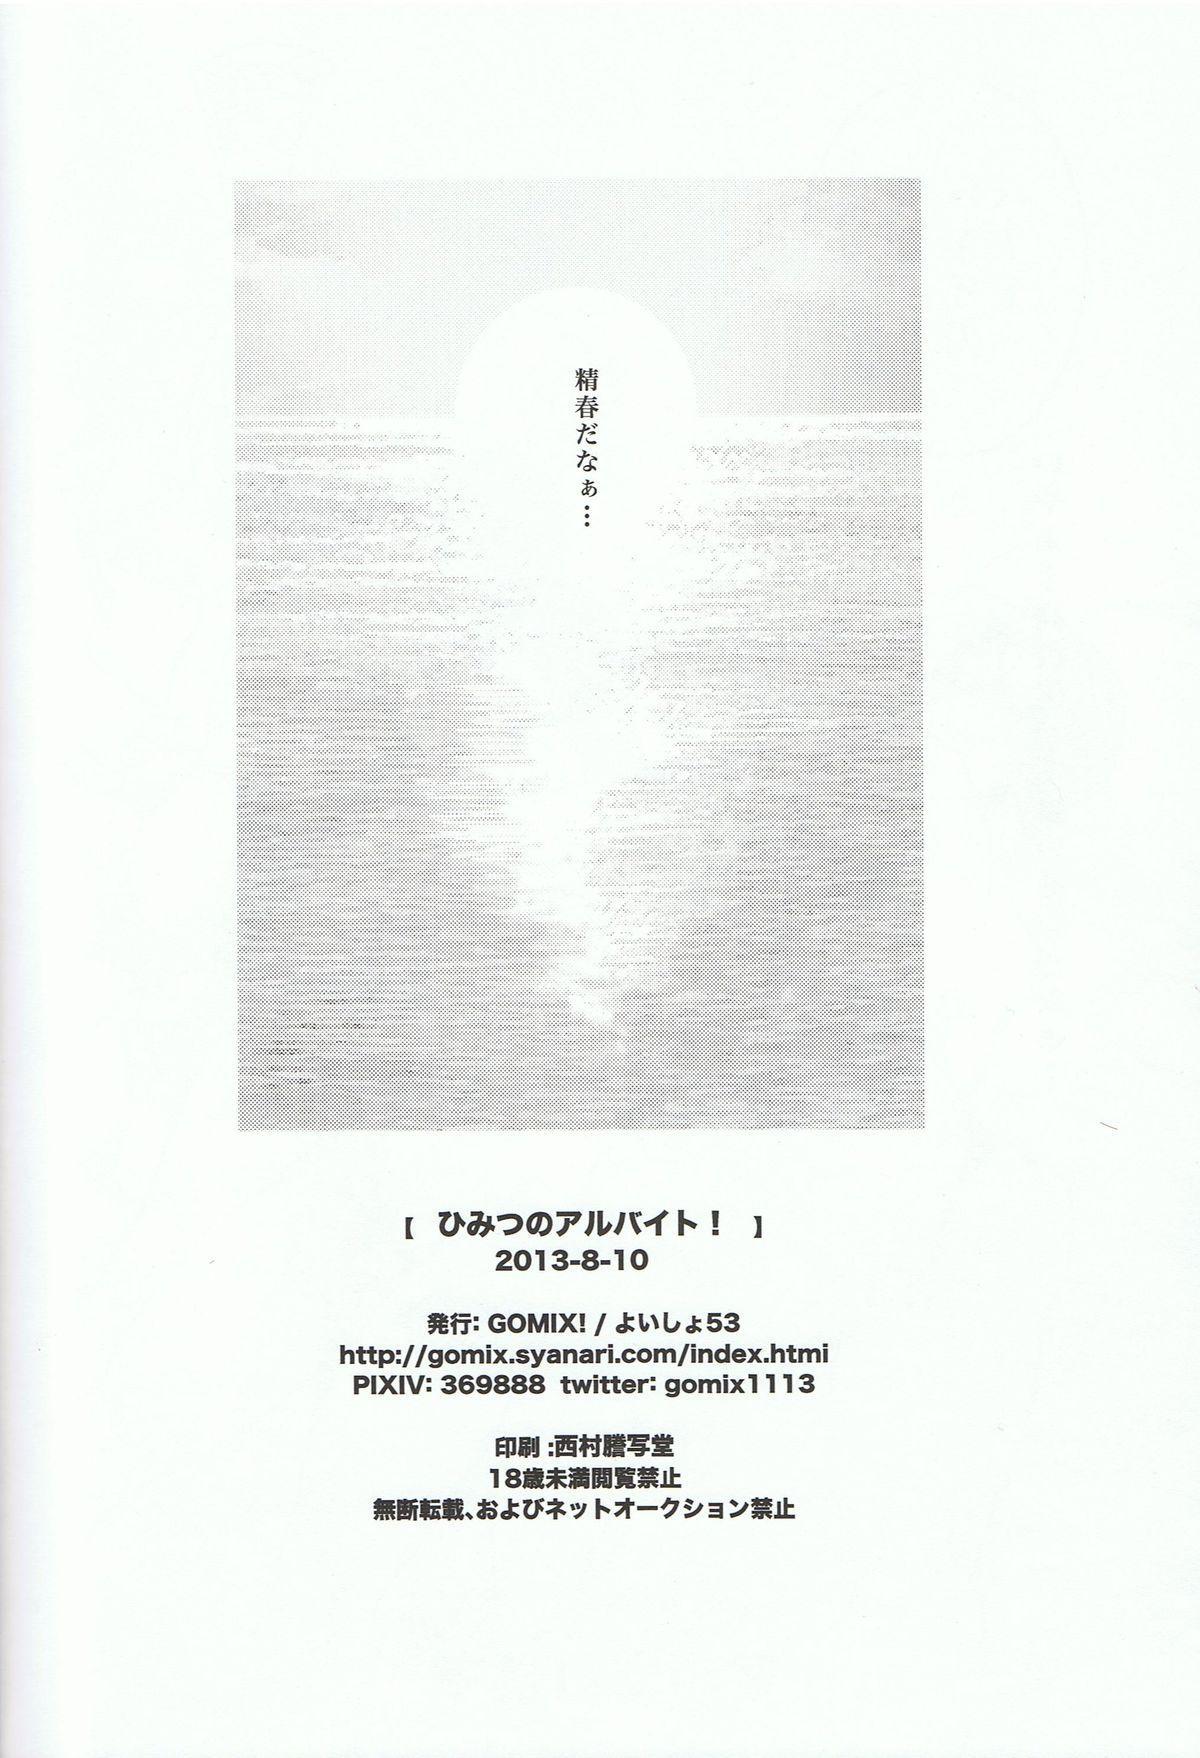 Himitsu no Arbeit! 28